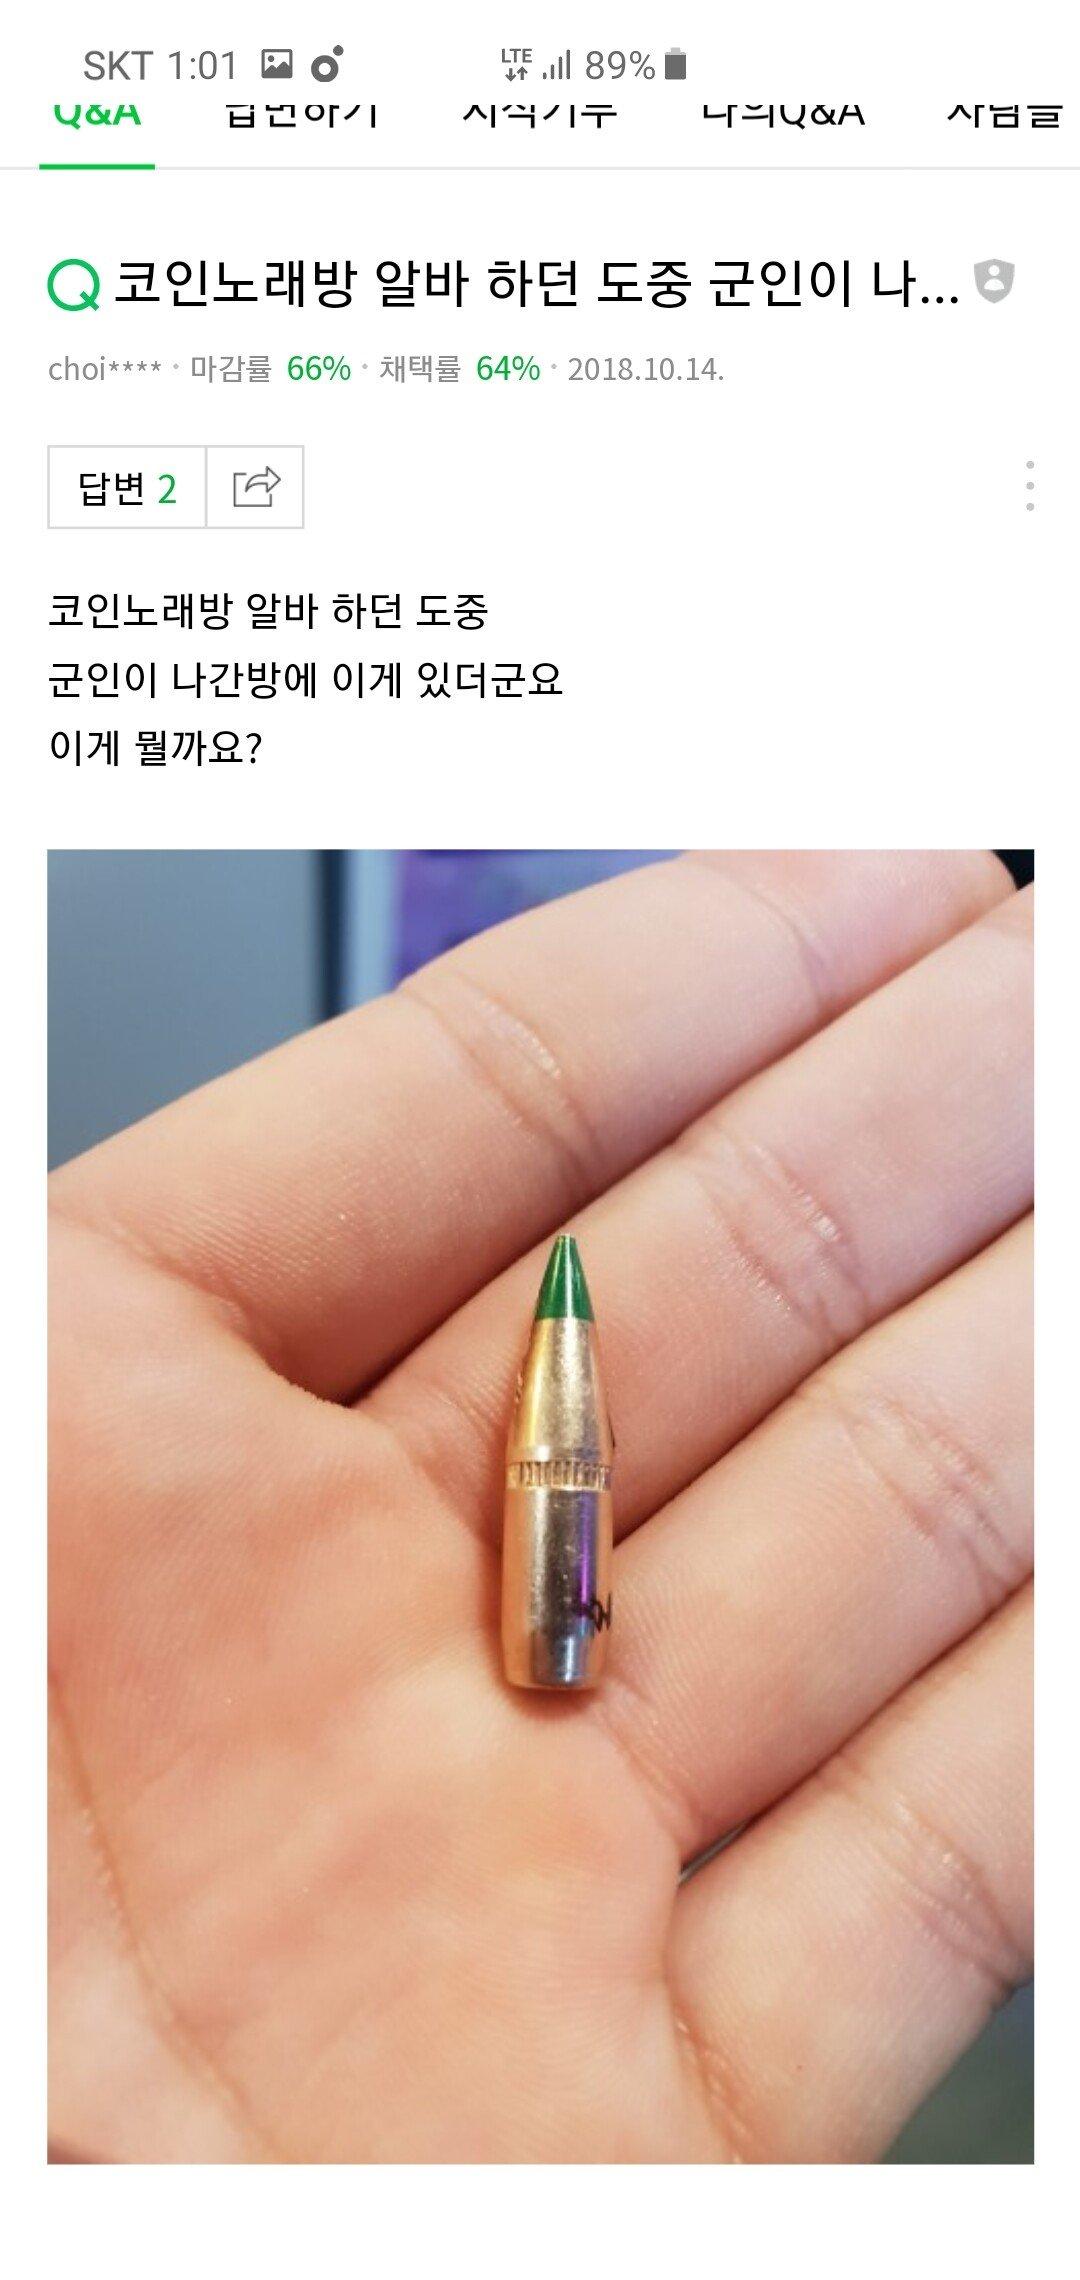 Screenshot_20190608-130159_Samsung Internet.jpg 코노에서 발견된 5.56mm 탄....jpg